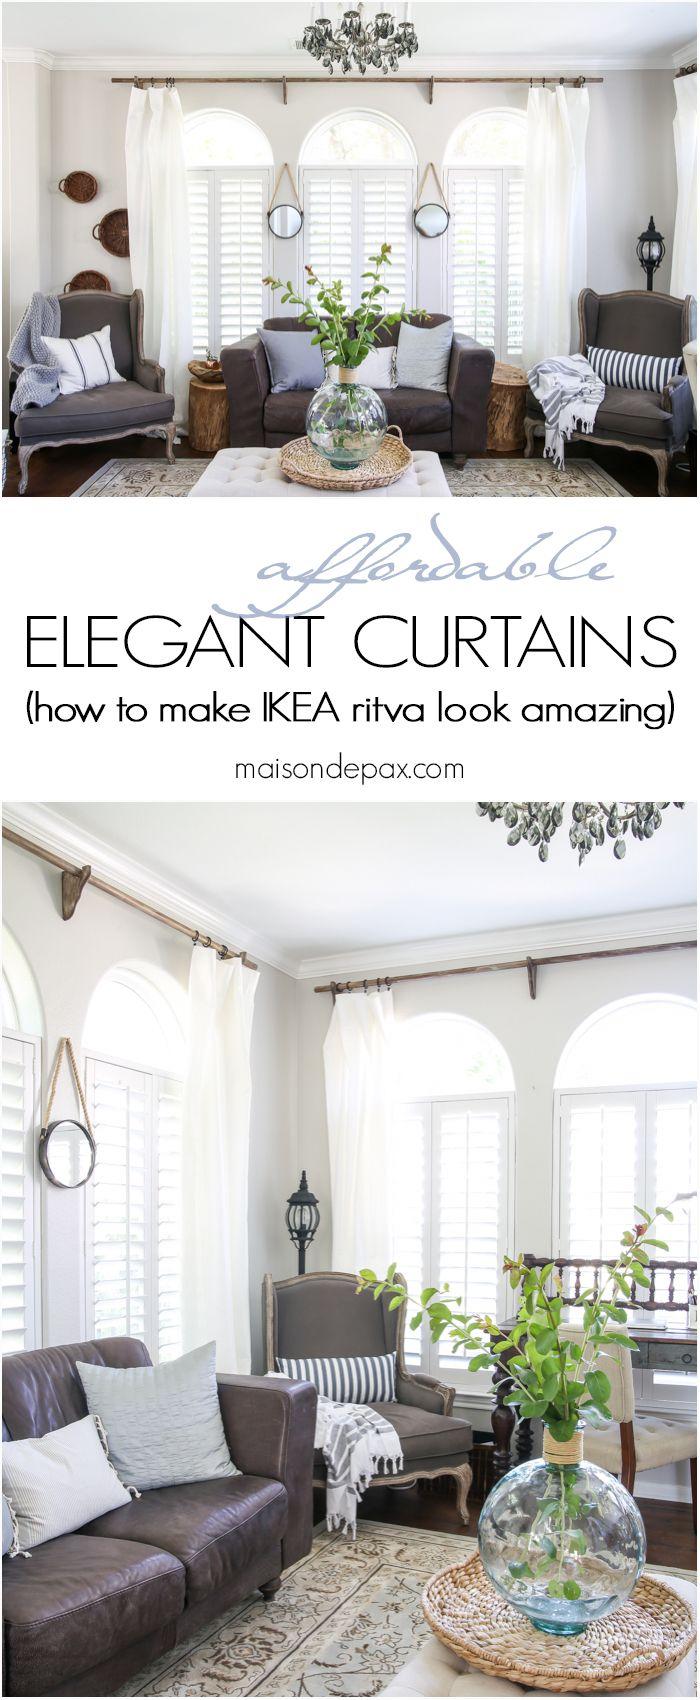 Bay window decor ideas  classy yet affordable white curtains  diy curtain rods diy